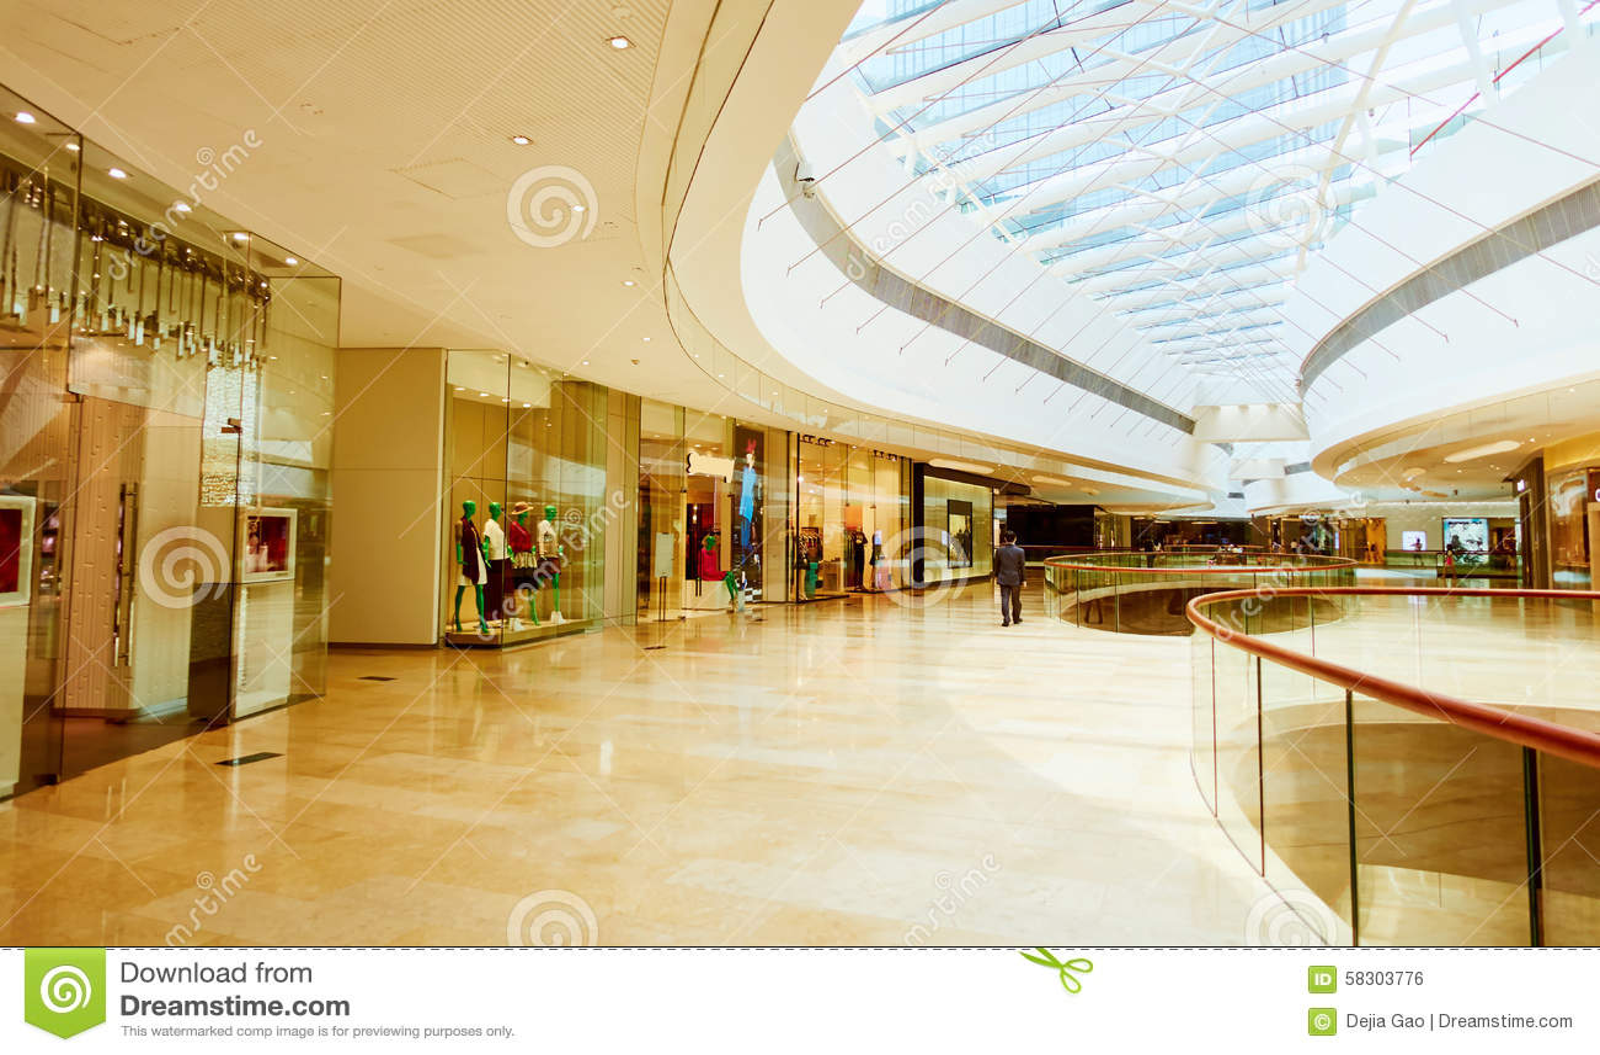 Shopping Mall Center Stock Photo Image 58303776